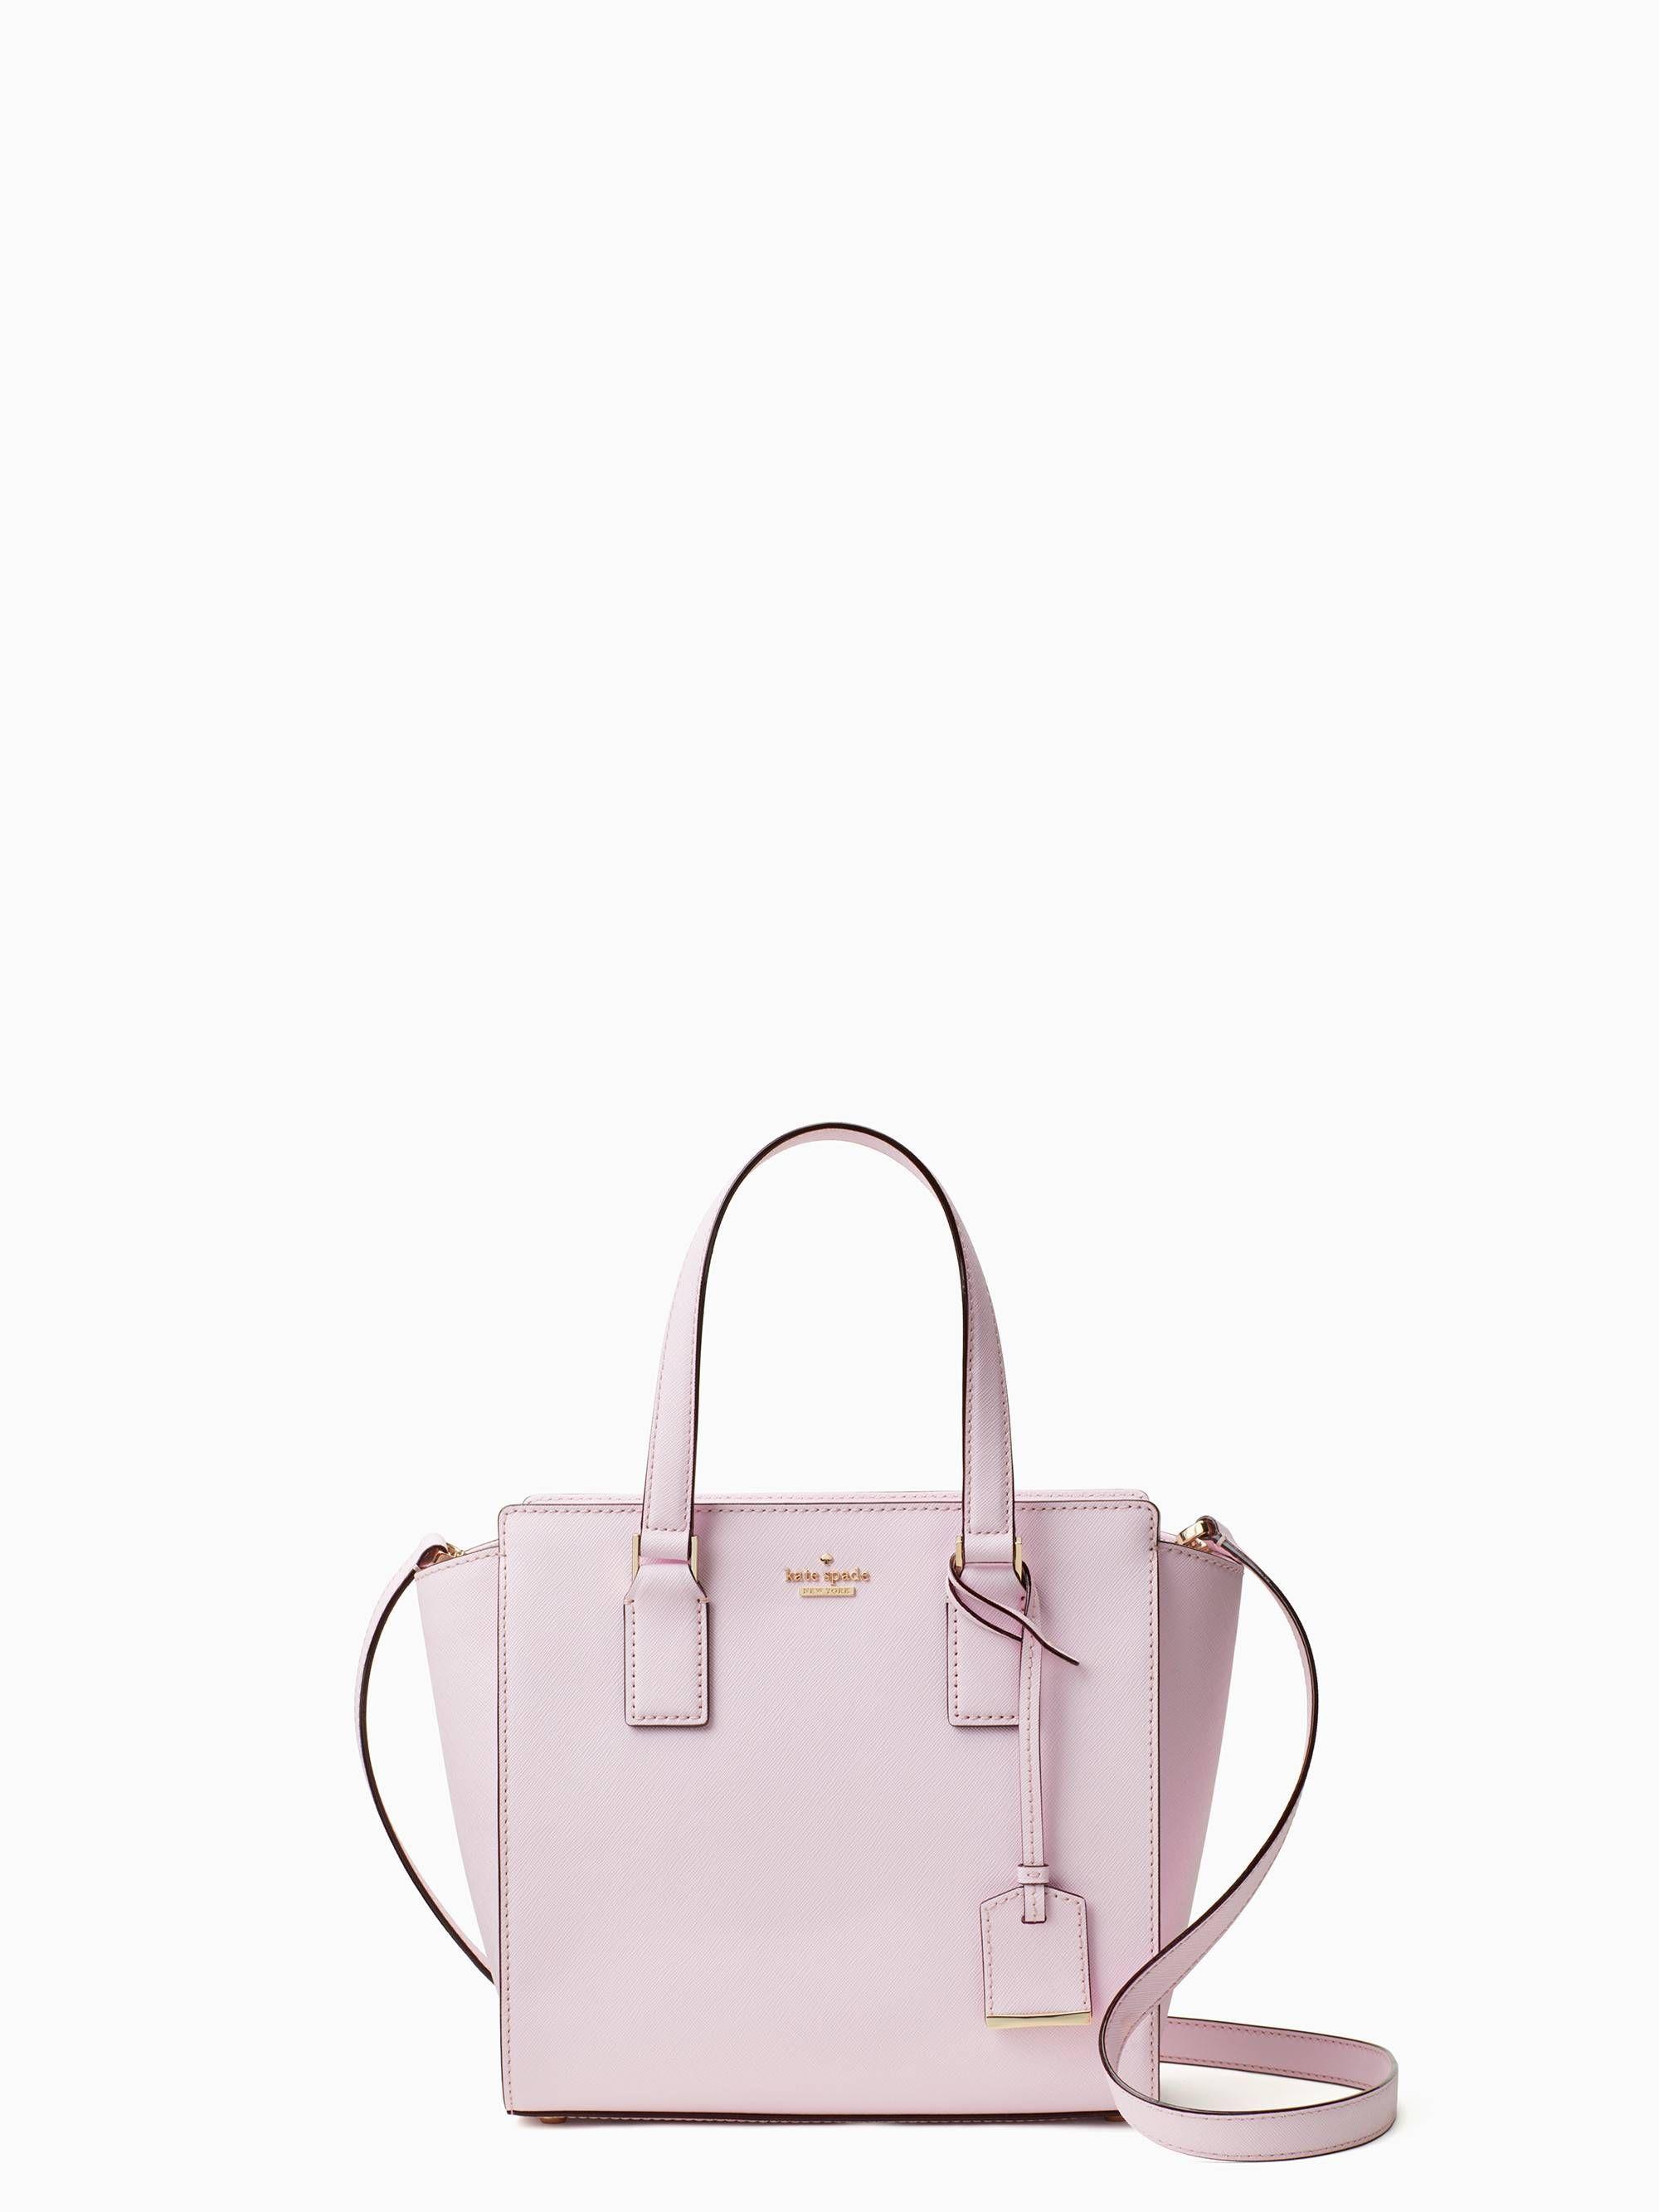 0356fd6e3edb cameron street small hayden   Kate Spade New York   my Handbags ...